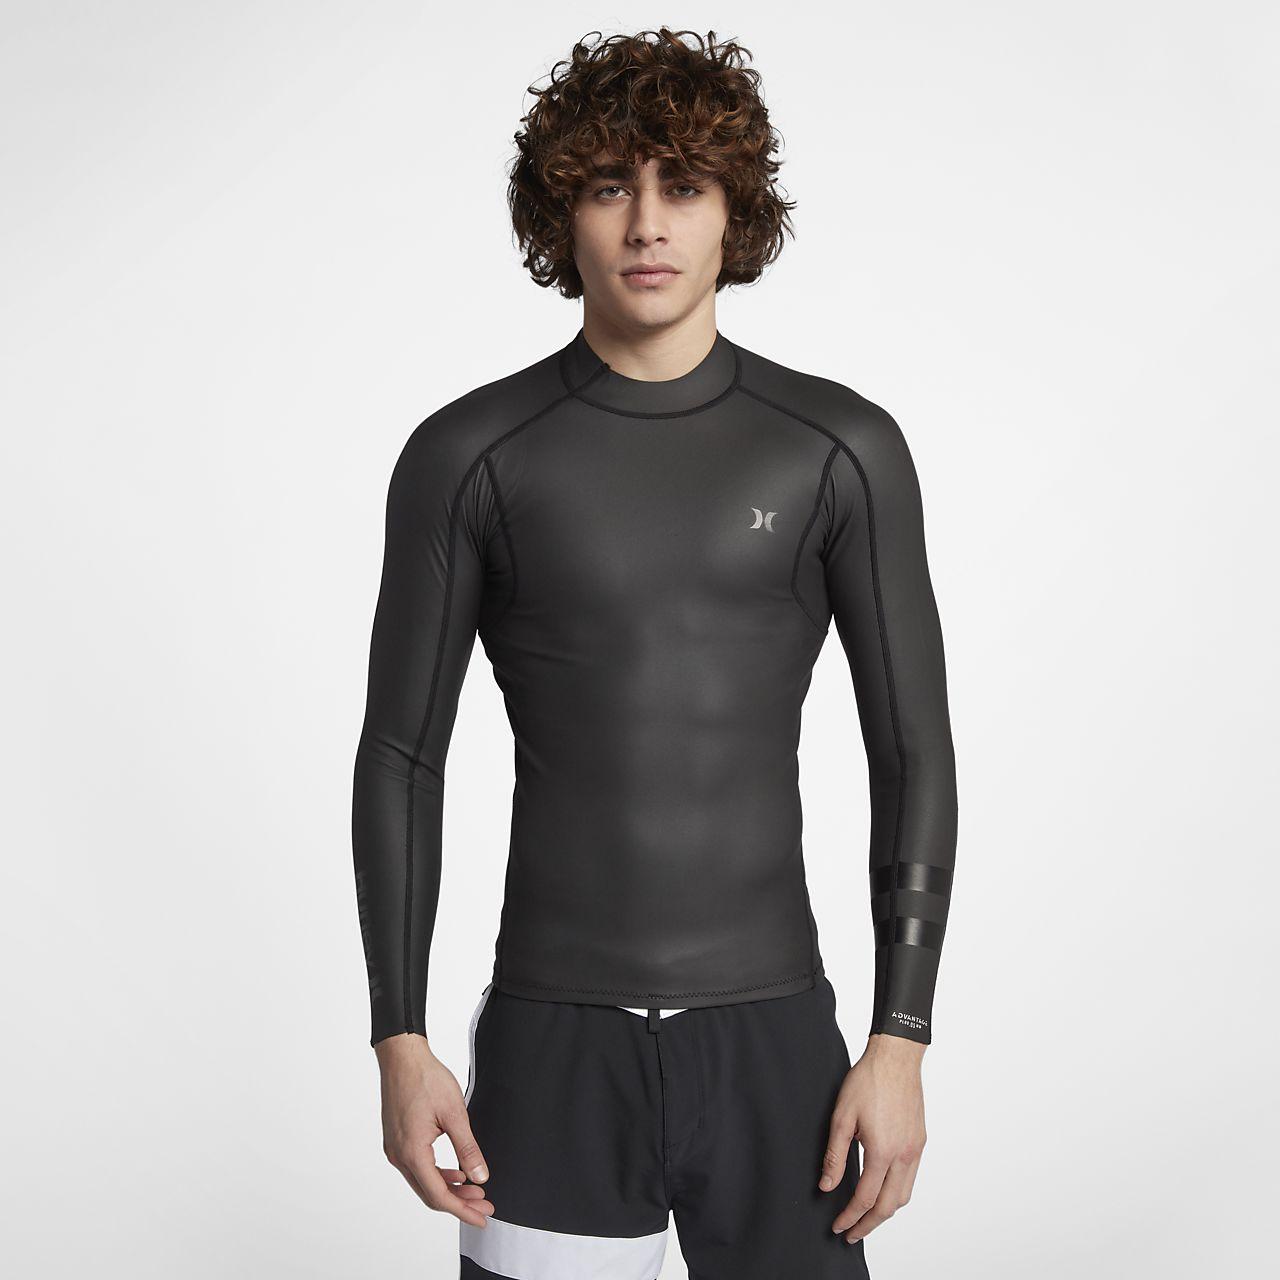 Hurley Advantage Plus Windskin Jacket Men's Wetsuit